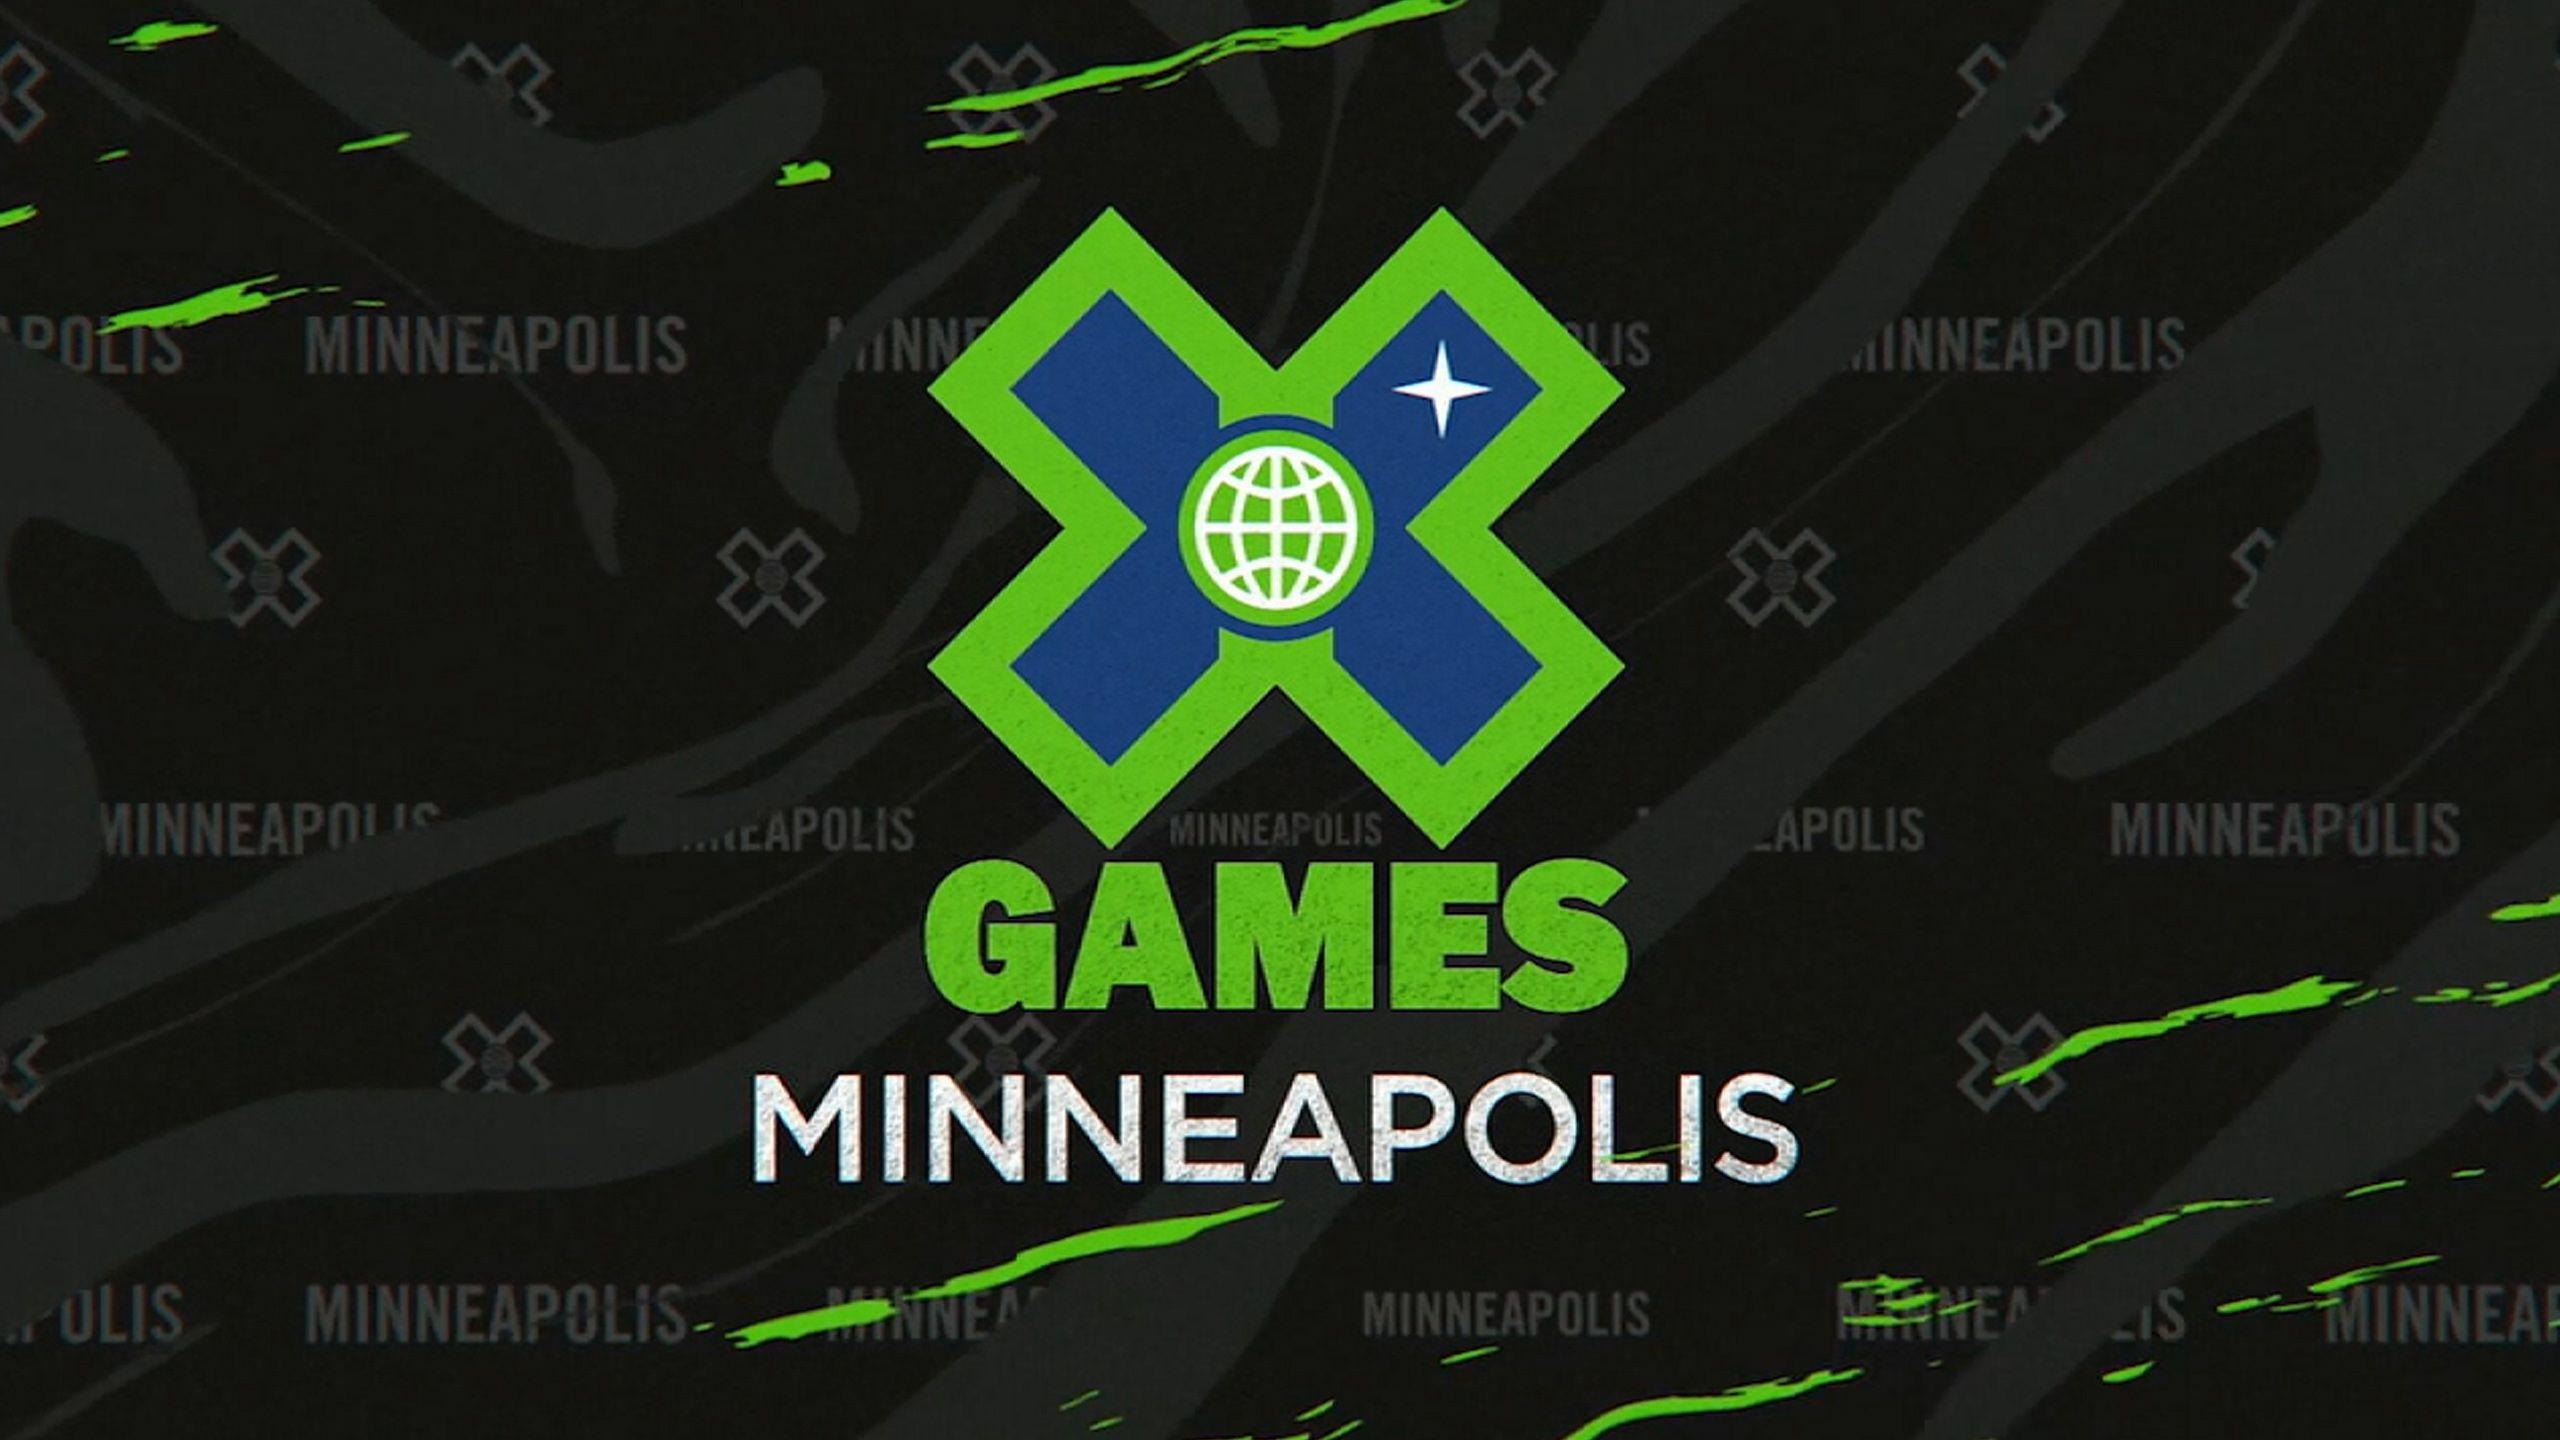 In Spanish - X Games Minneapolis 2018